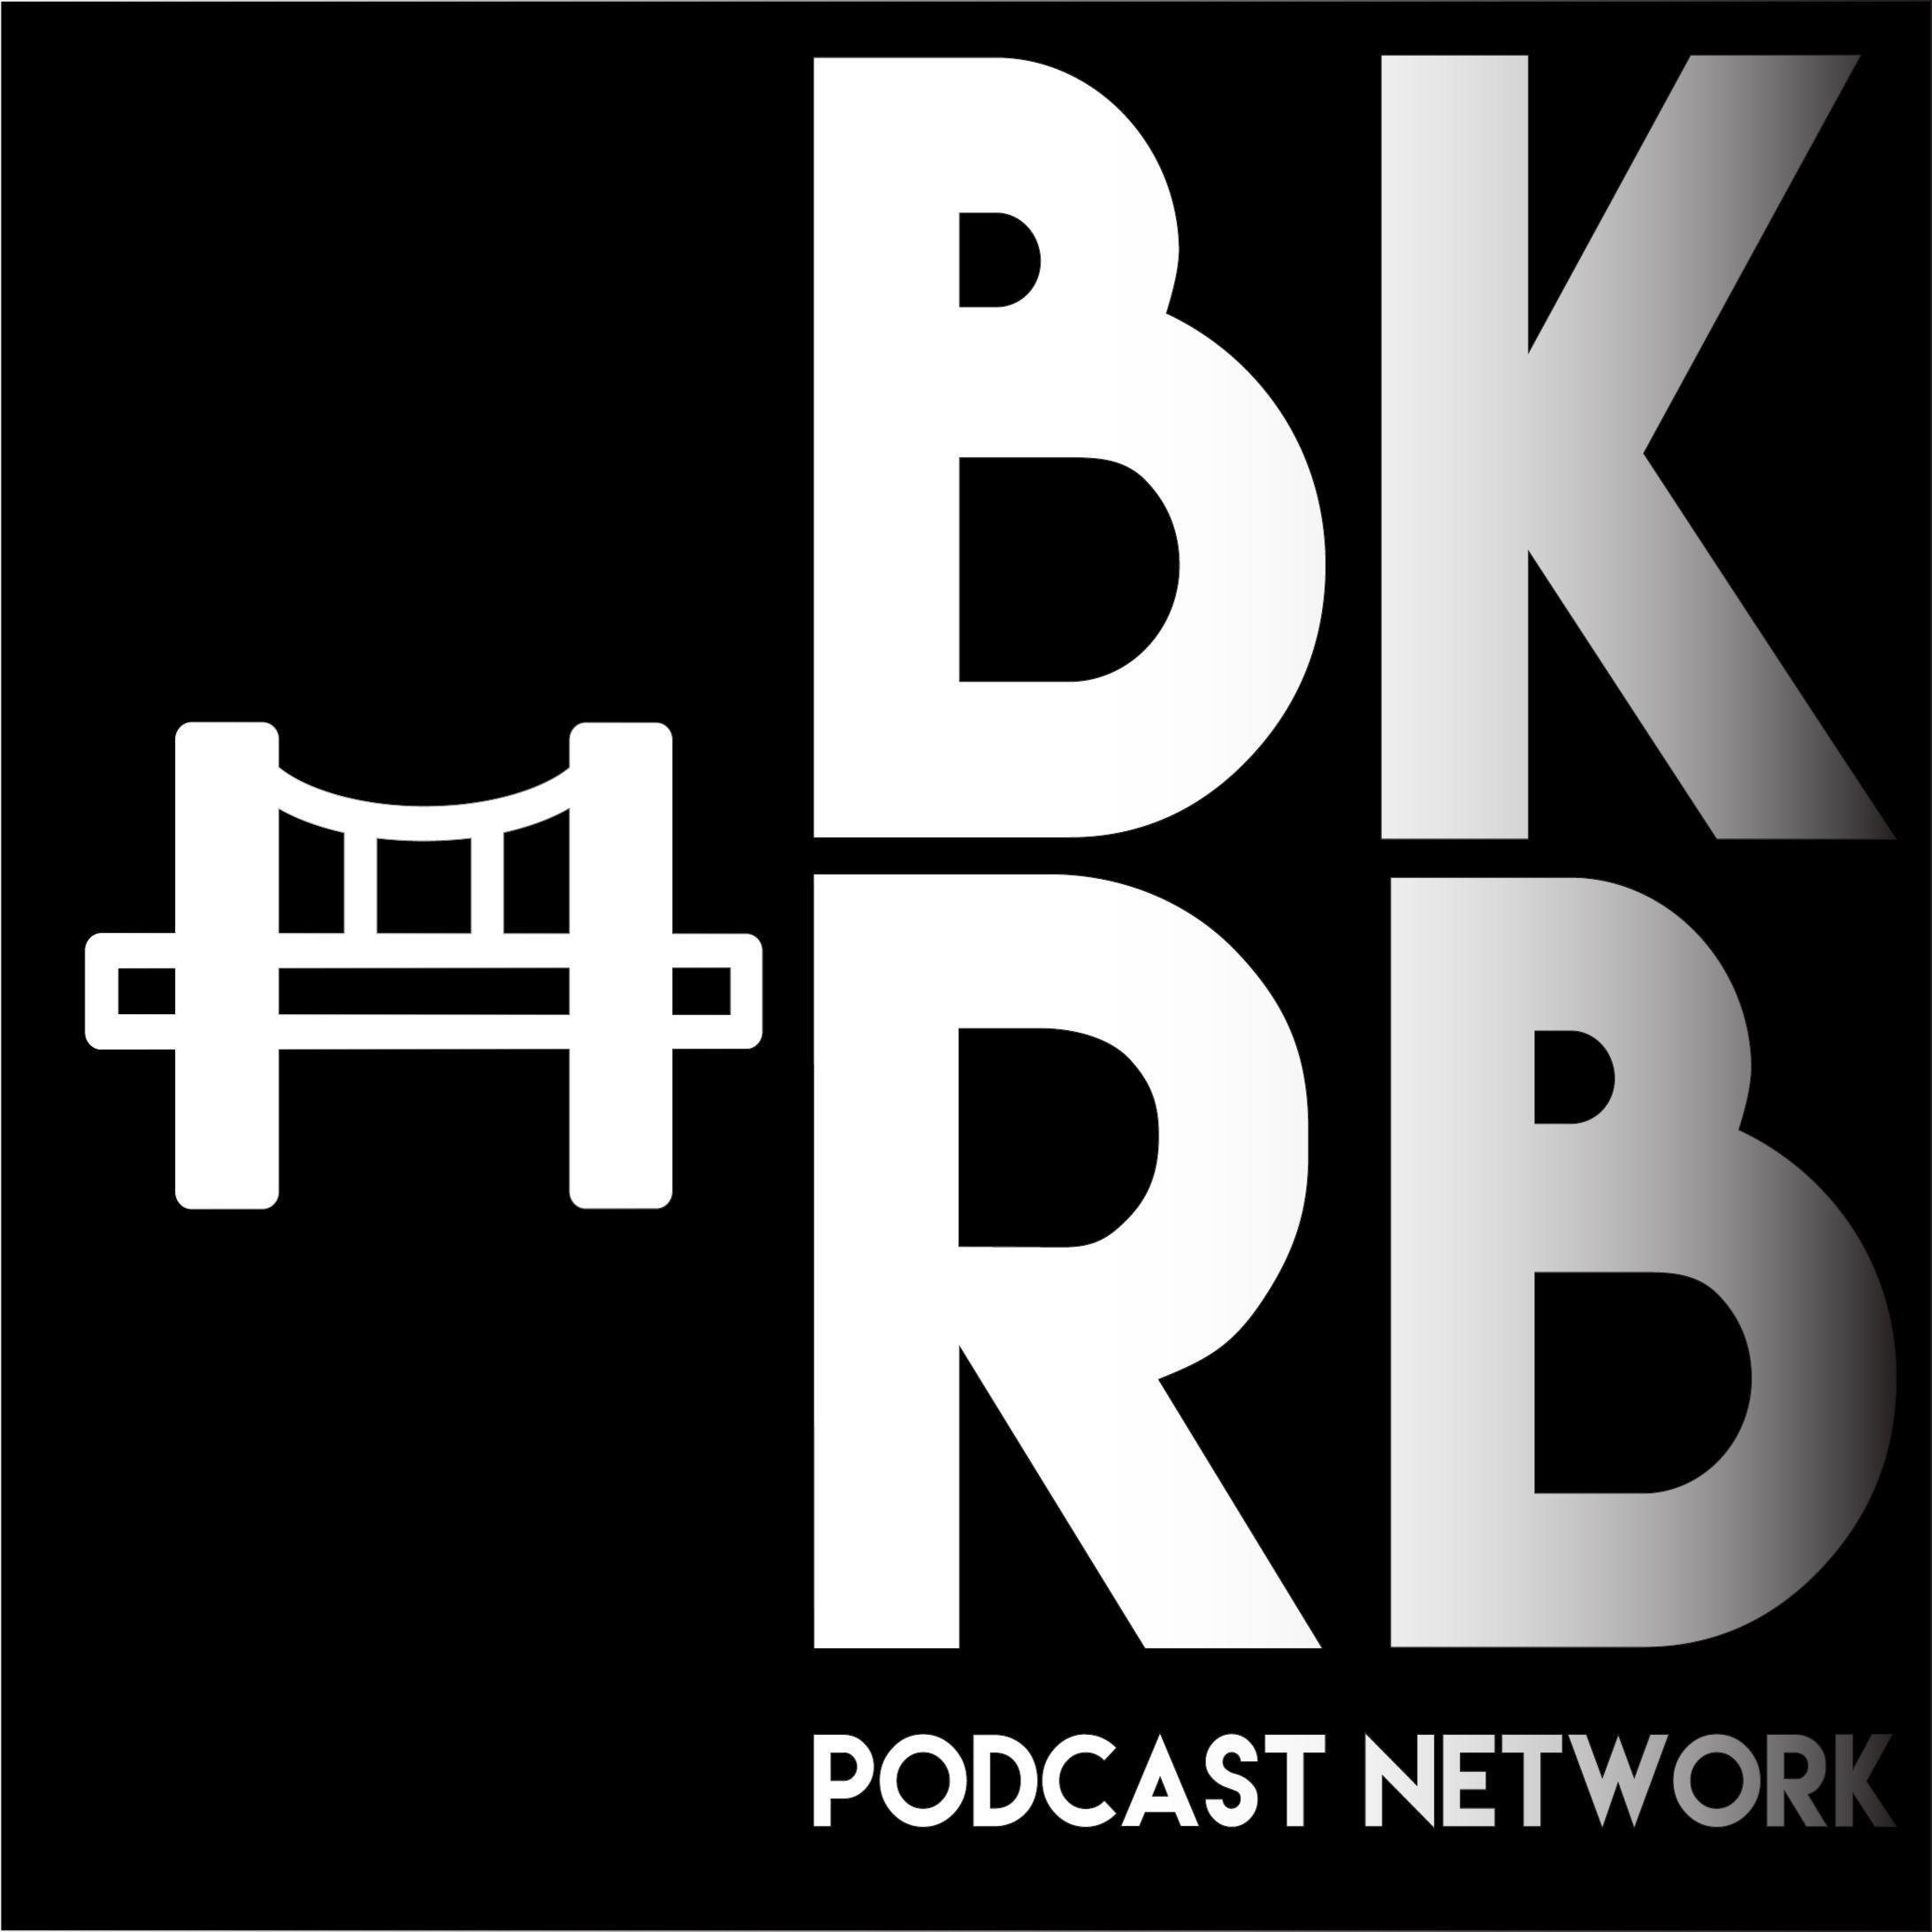 Brooklyn Rebound Network